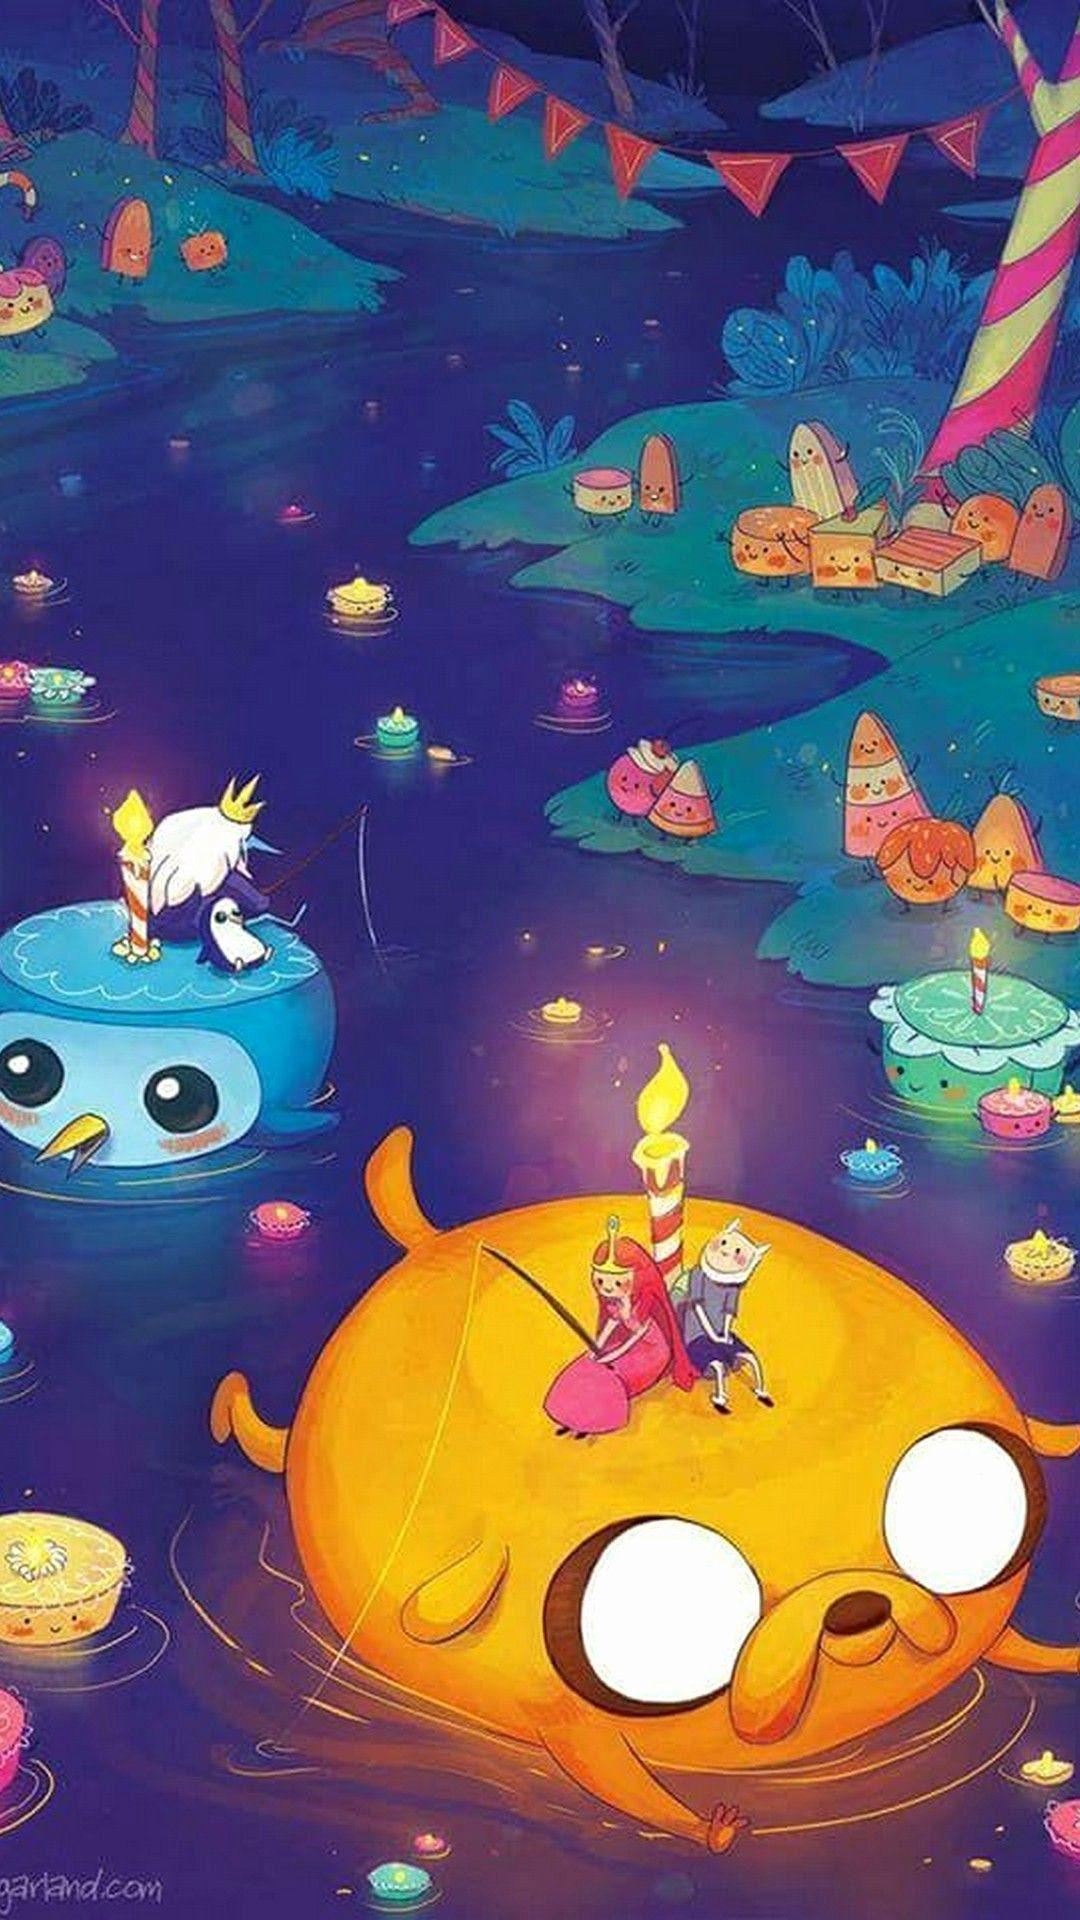 Adventure Time Desktop Wallpaper Hd Best Of Adventure Time Wallpaper Iphone Adventure Time Wallpaper Adventure Time Iphone Wallpaper Adventure Time Background